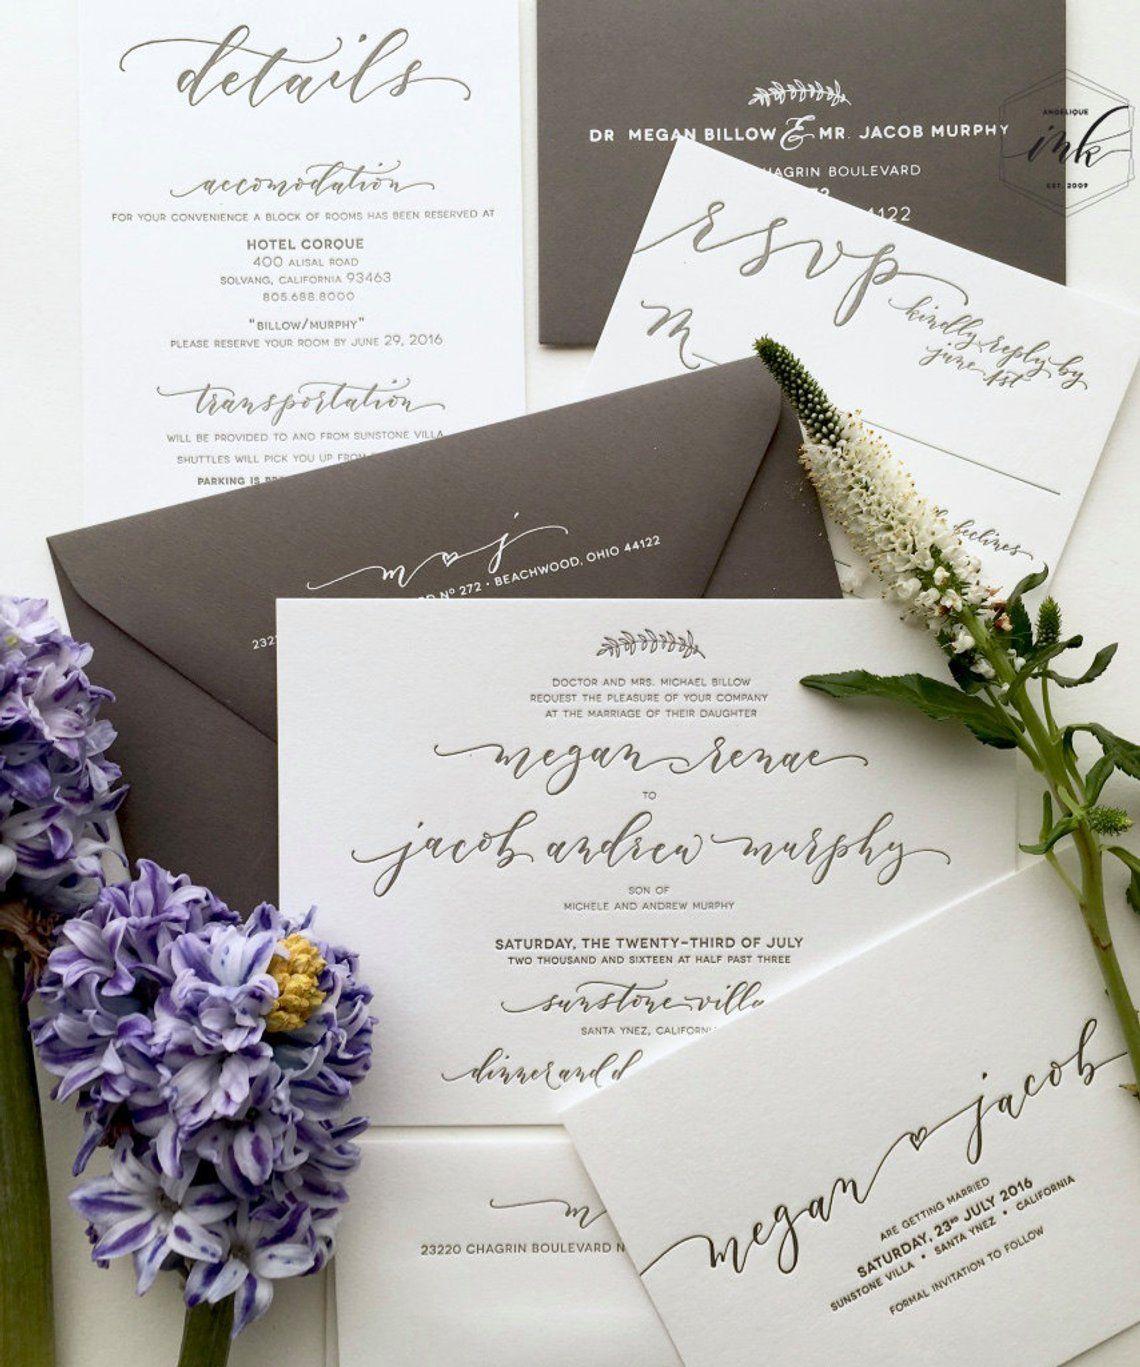 Boho Chic Handwritten Calligraphy Letterpress Wedding